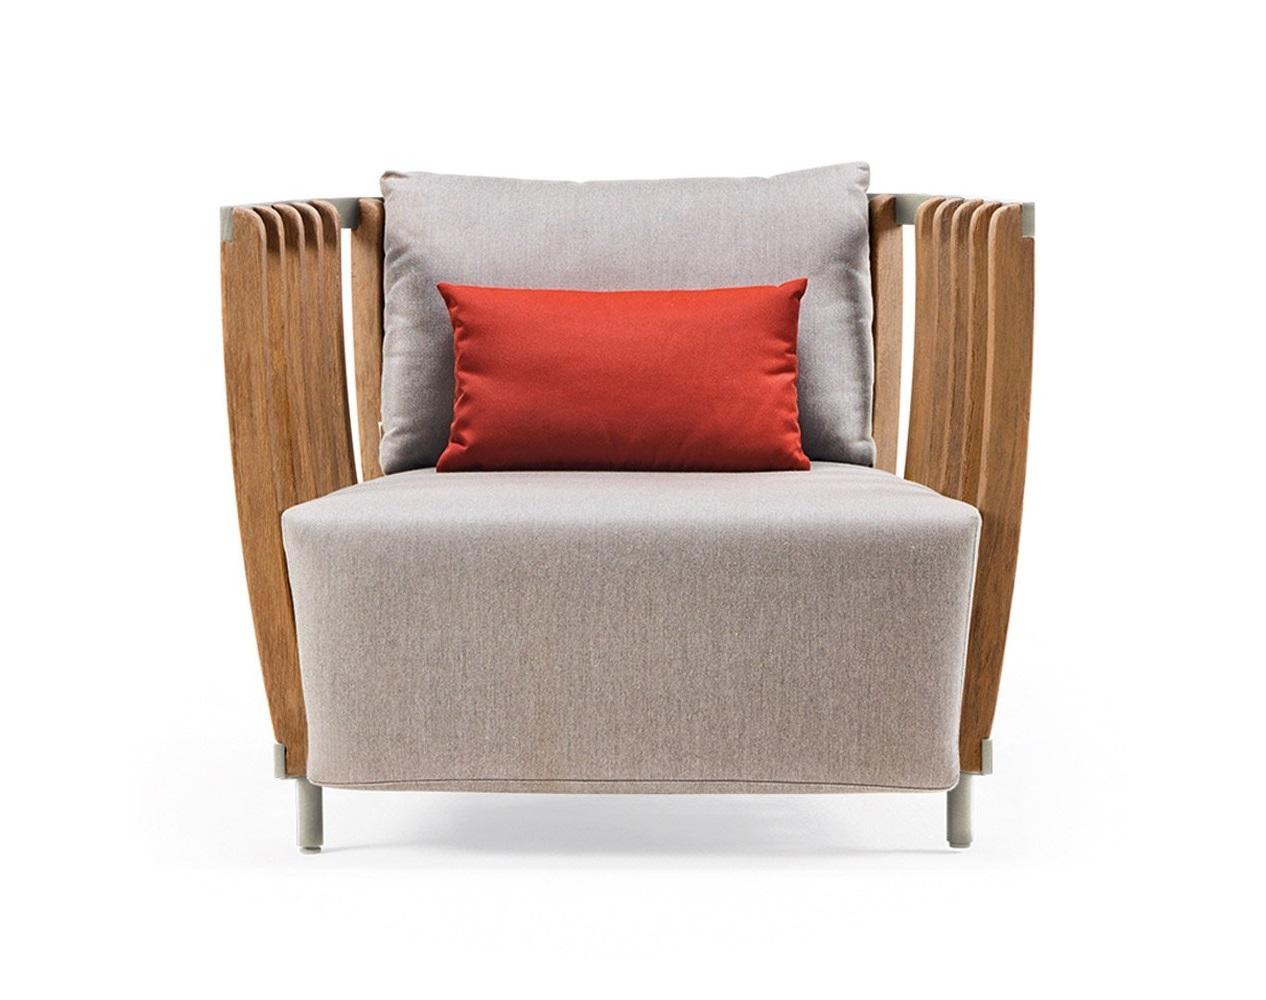 Подвесное кресло ETHIMO 15447063 от thefurnish